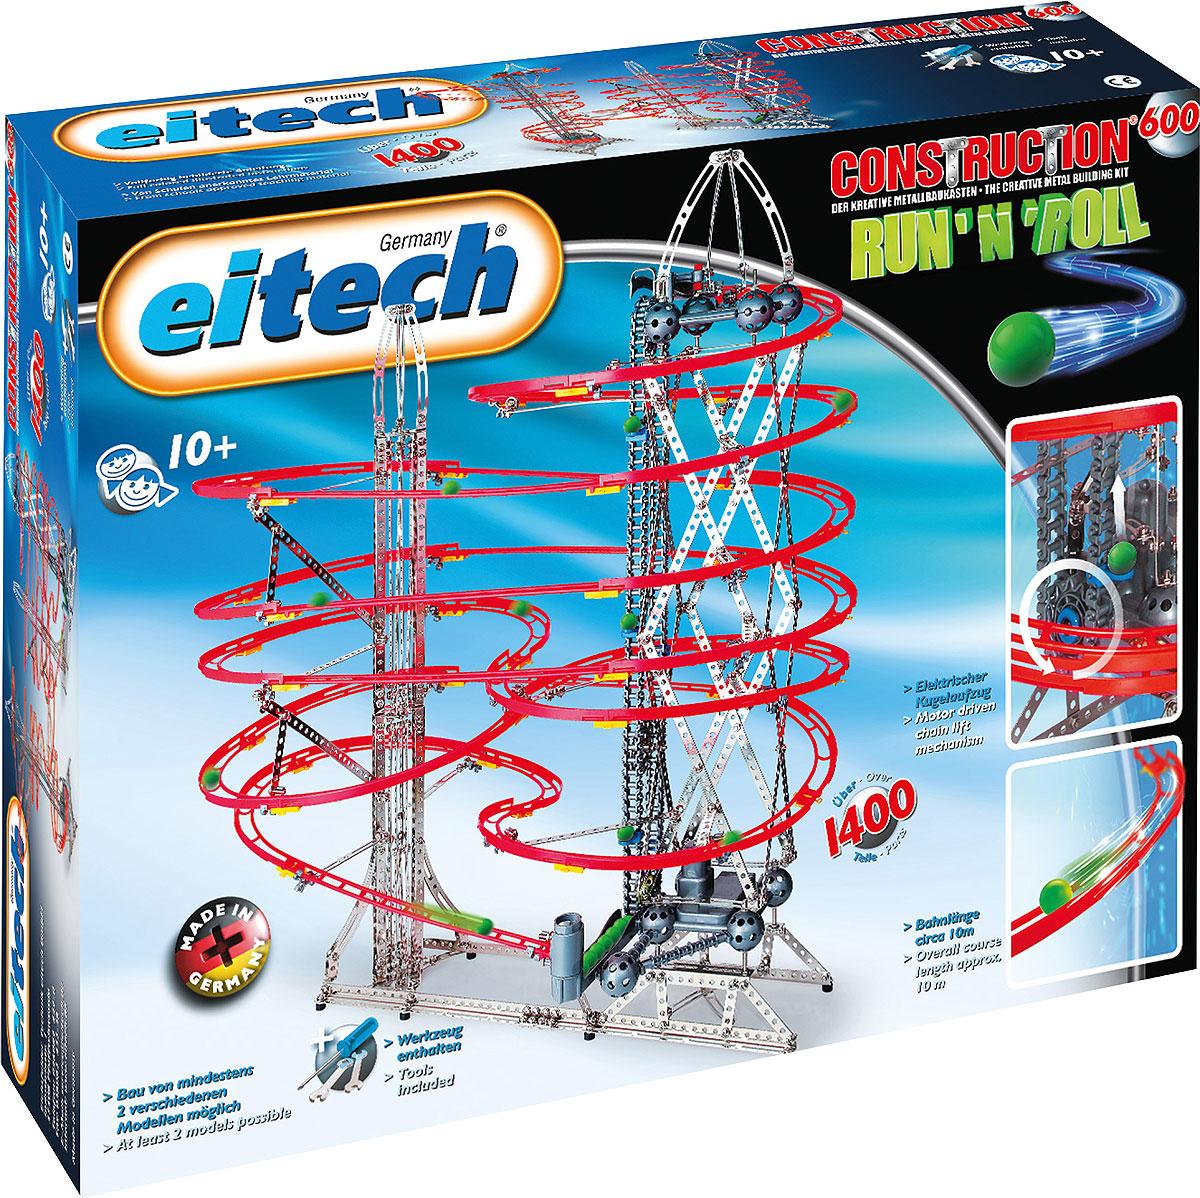 Eitech Конструктор металлический Серпантин 00600 magformers магнитный конструктор creative 90